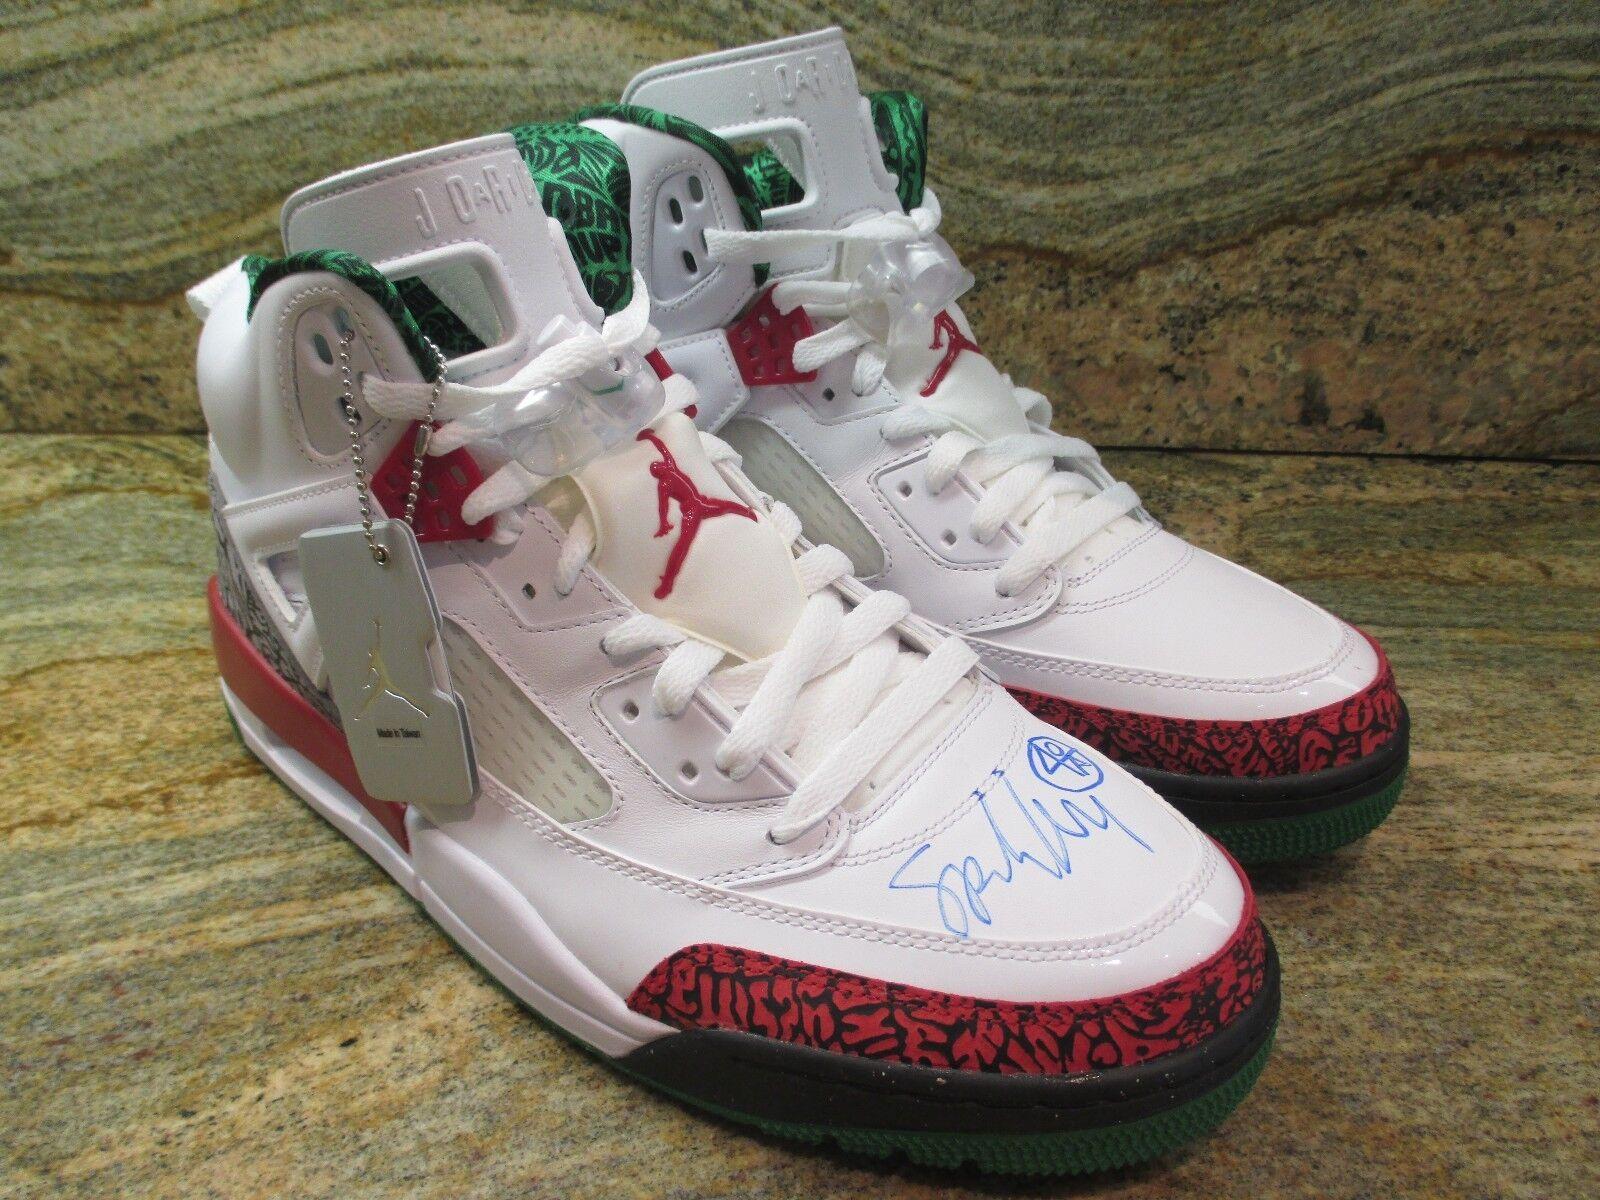 Nike Air Jordan Spizike OG SZ 11 Spike Lee Autographed blanc Retro 315371-125